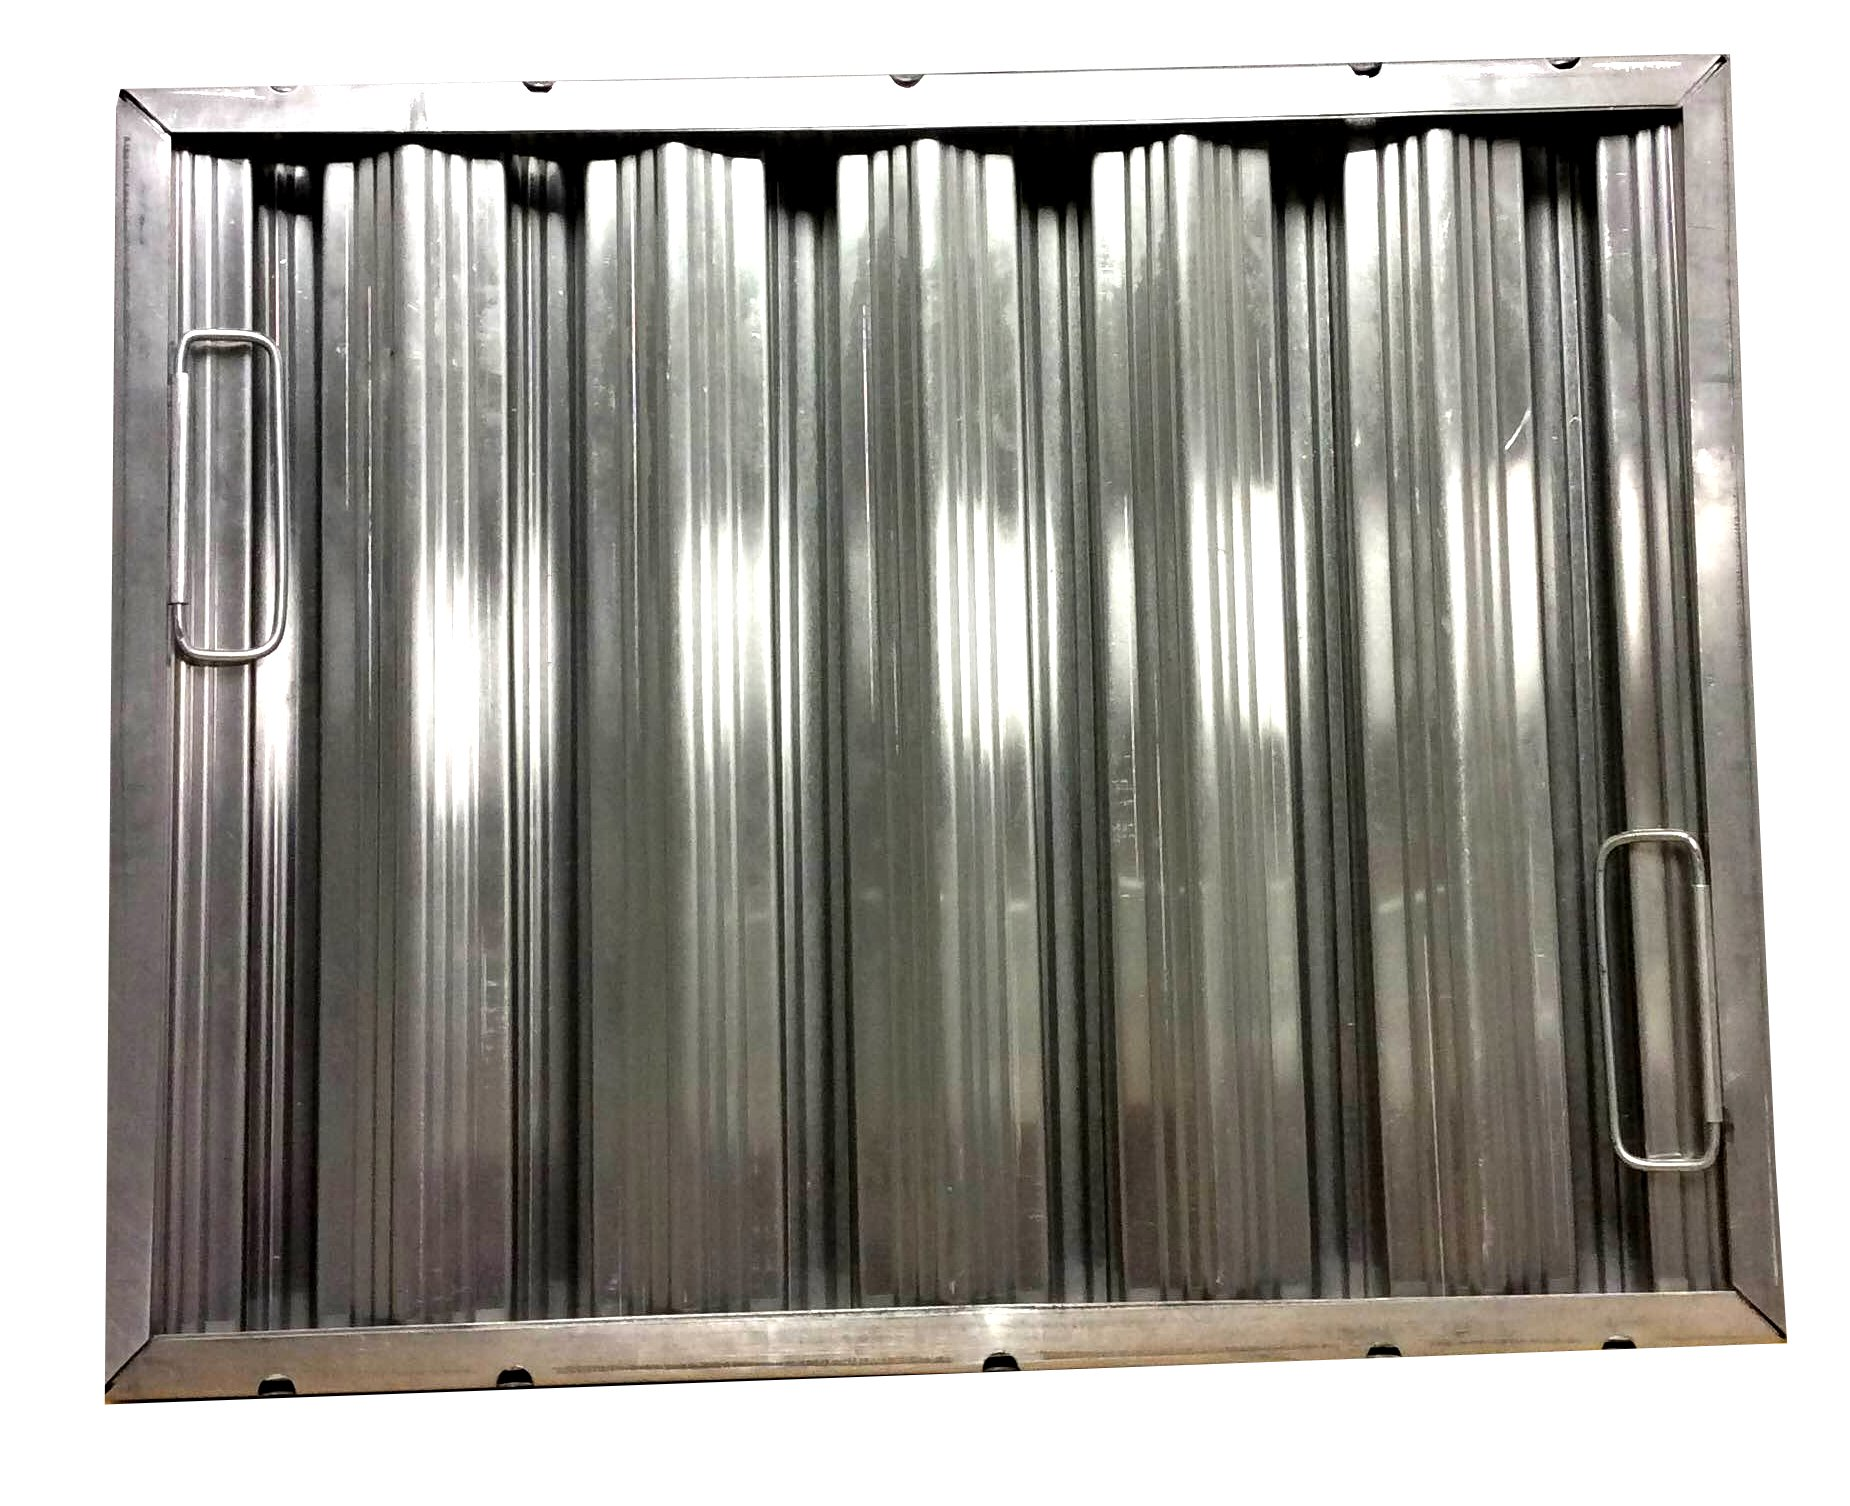 16'' tall x 20'' wide x 2'' Trine Heavy Duty Aluminum Restaurant Hood Baffle Filter (Dual Riveted / Ridged Baffle)